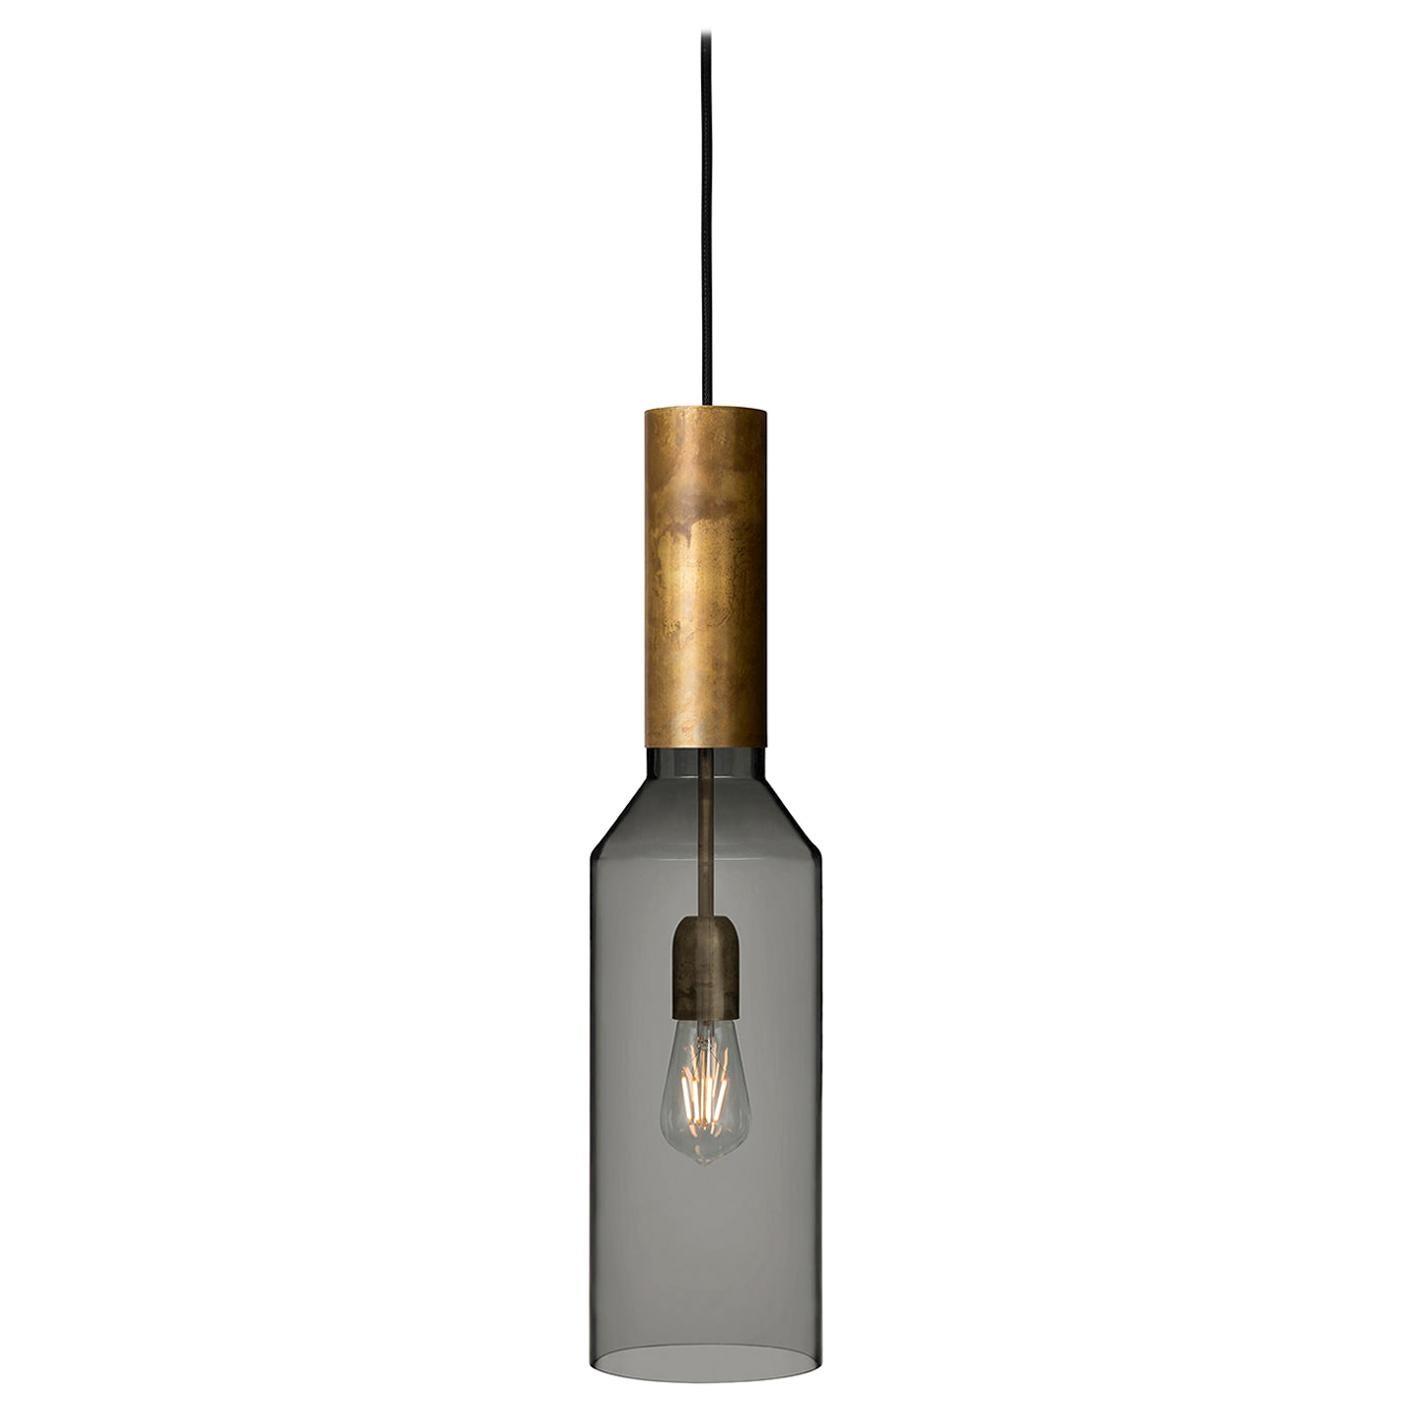 Sabina Grubbeson Fenomen Smal Rök Smoked Glass Ceiling Lamp by Konsthantver